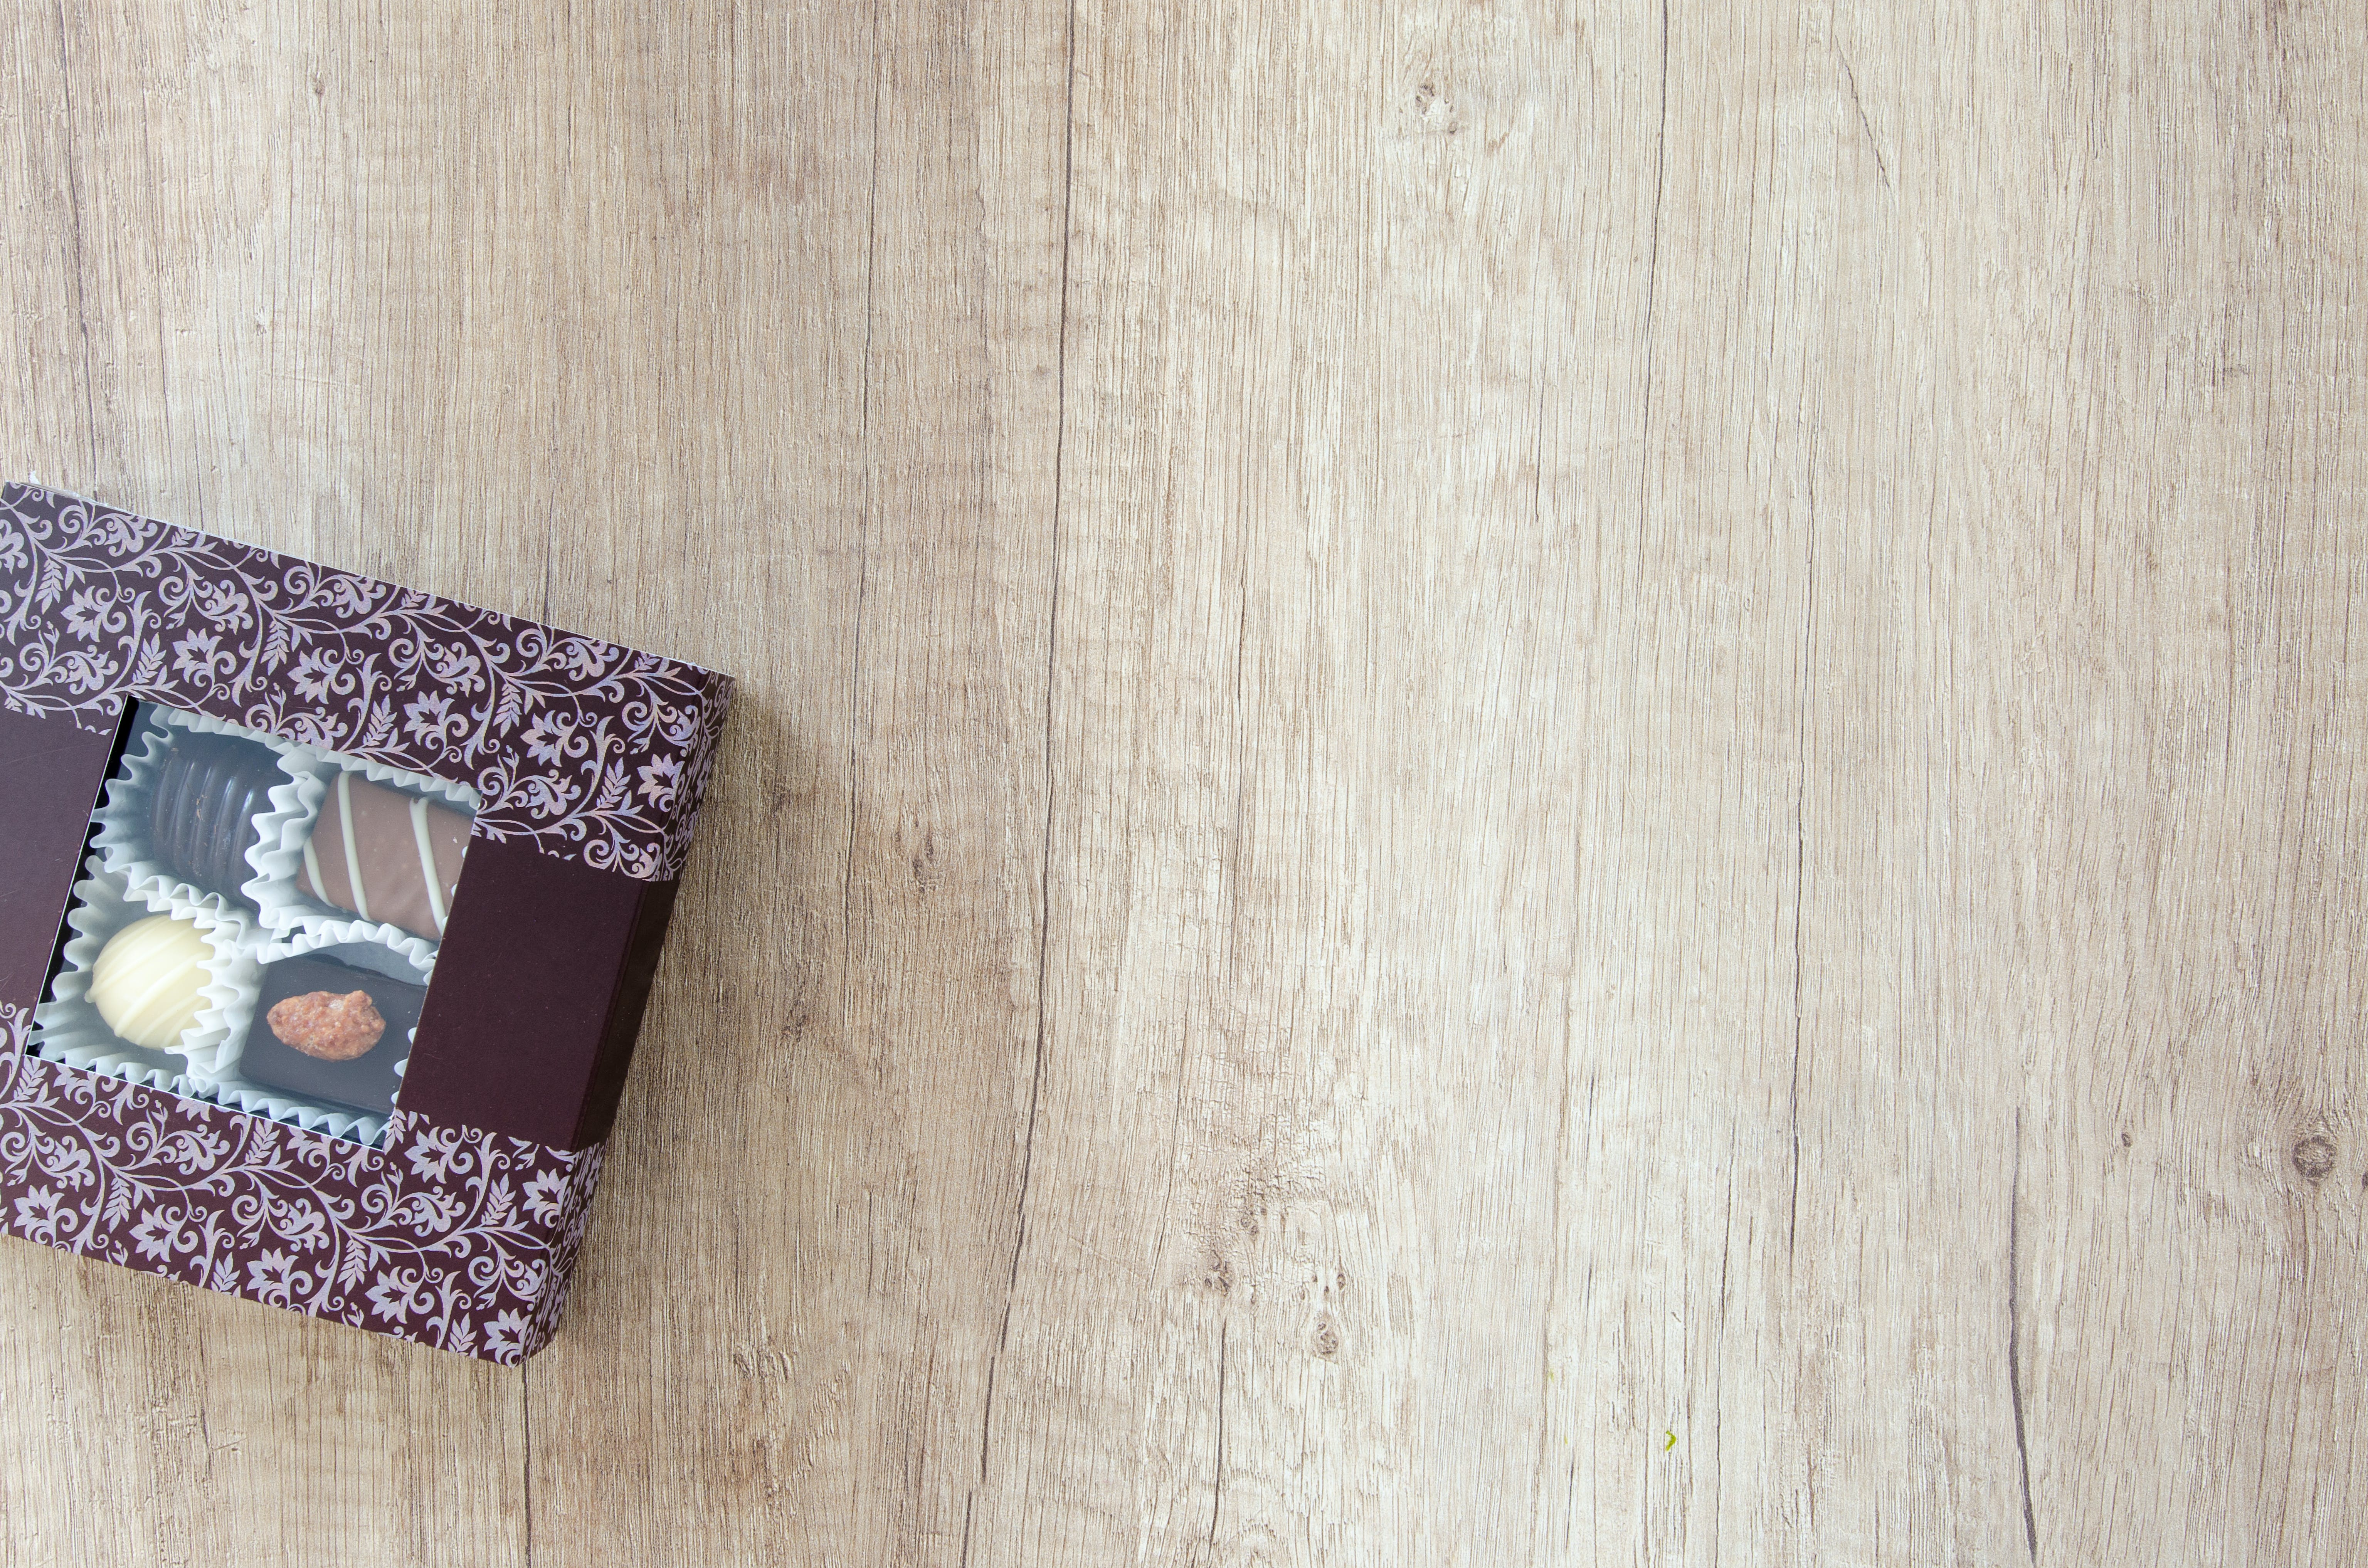 Chocolates Inside Box